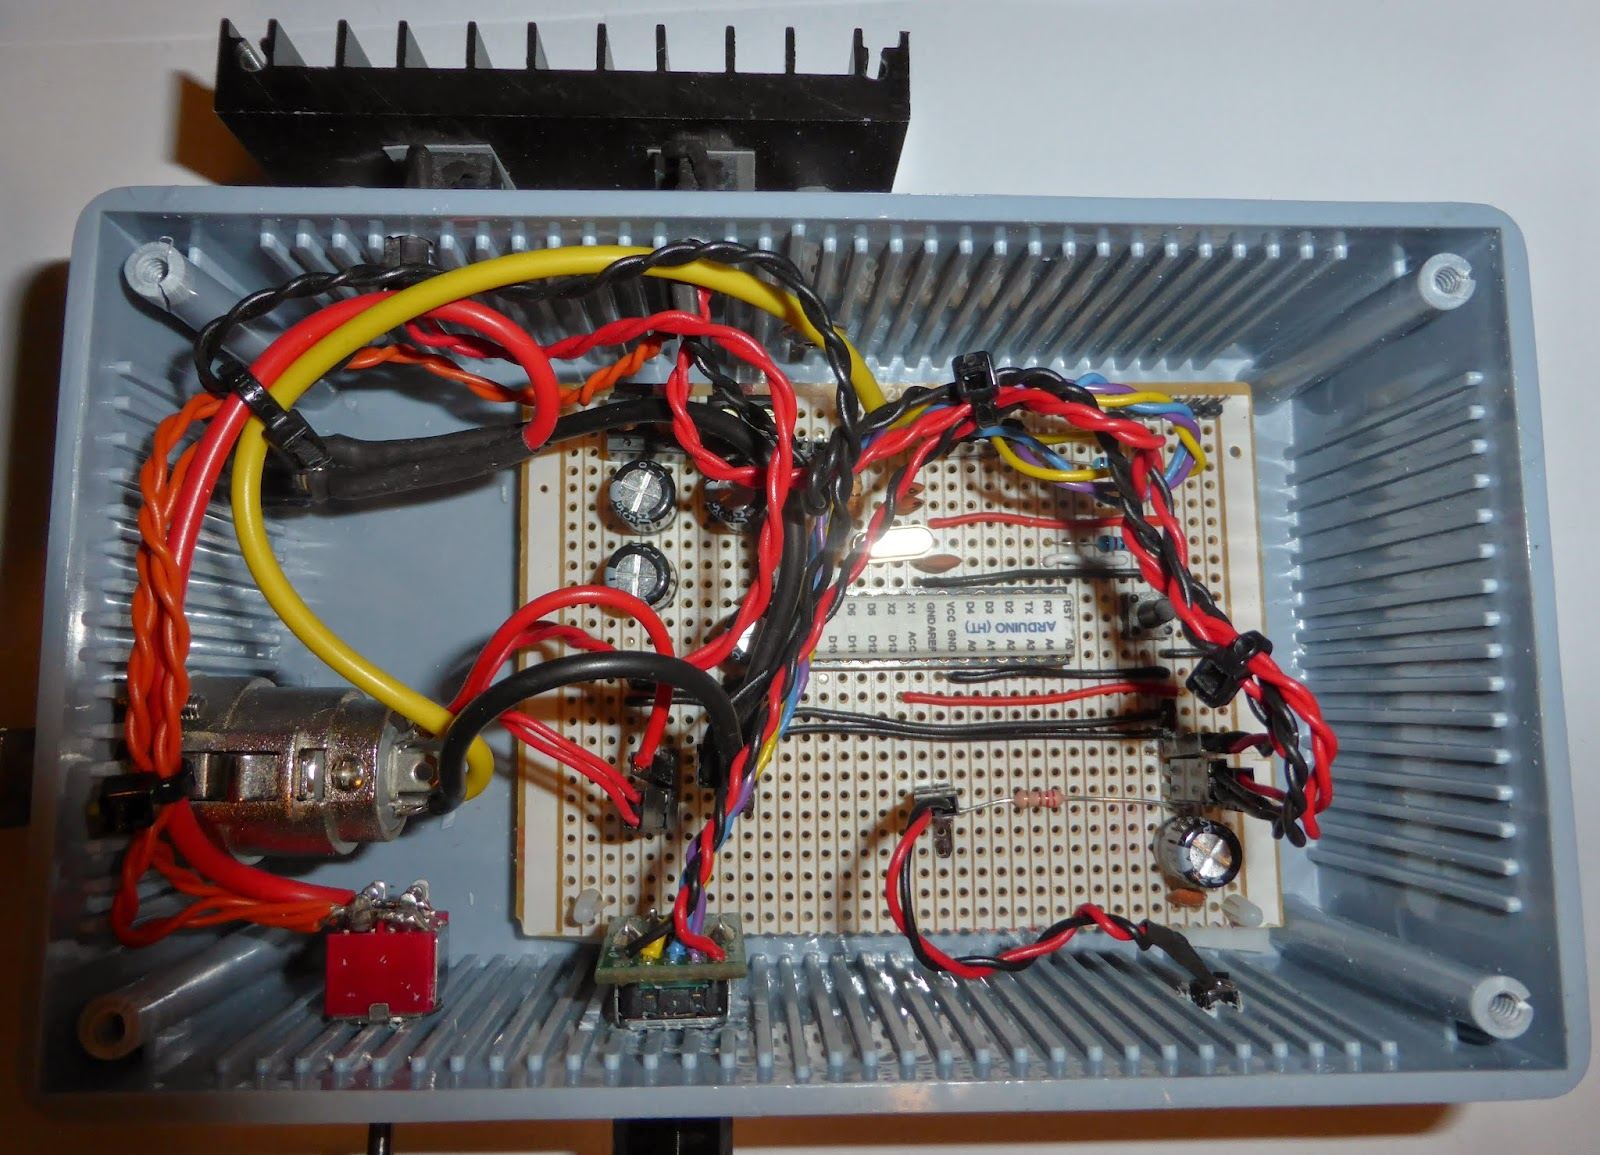 A tinkerers blog: Clarke milling machine - Lighting ring